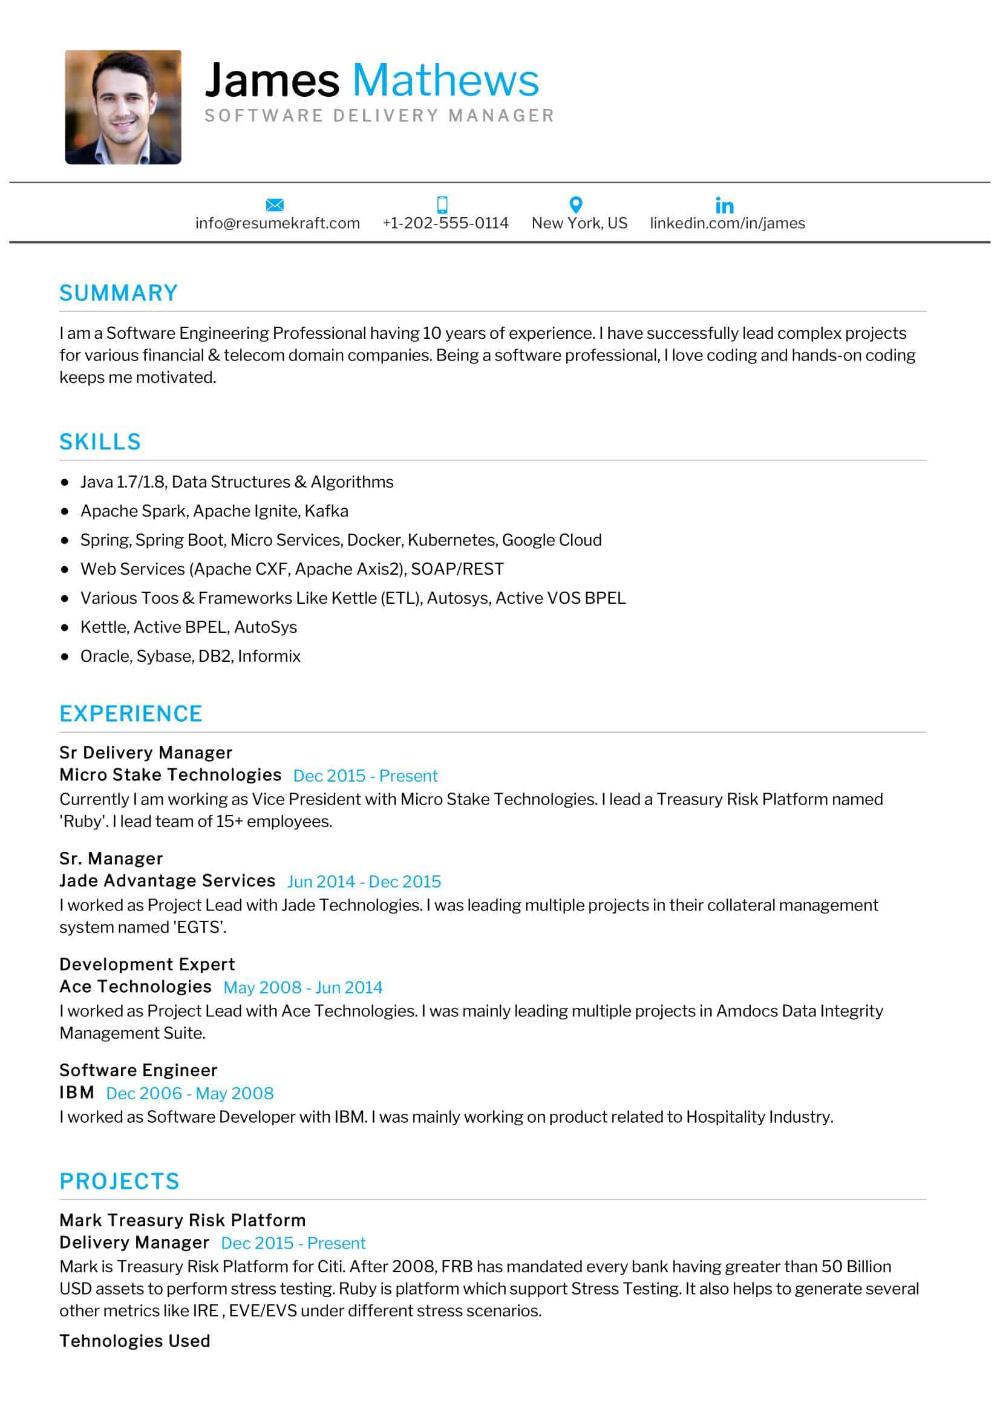 100 Professional Resume Samples For 2020 Resumekraft Manager Resume Professional Resume Examples Resume